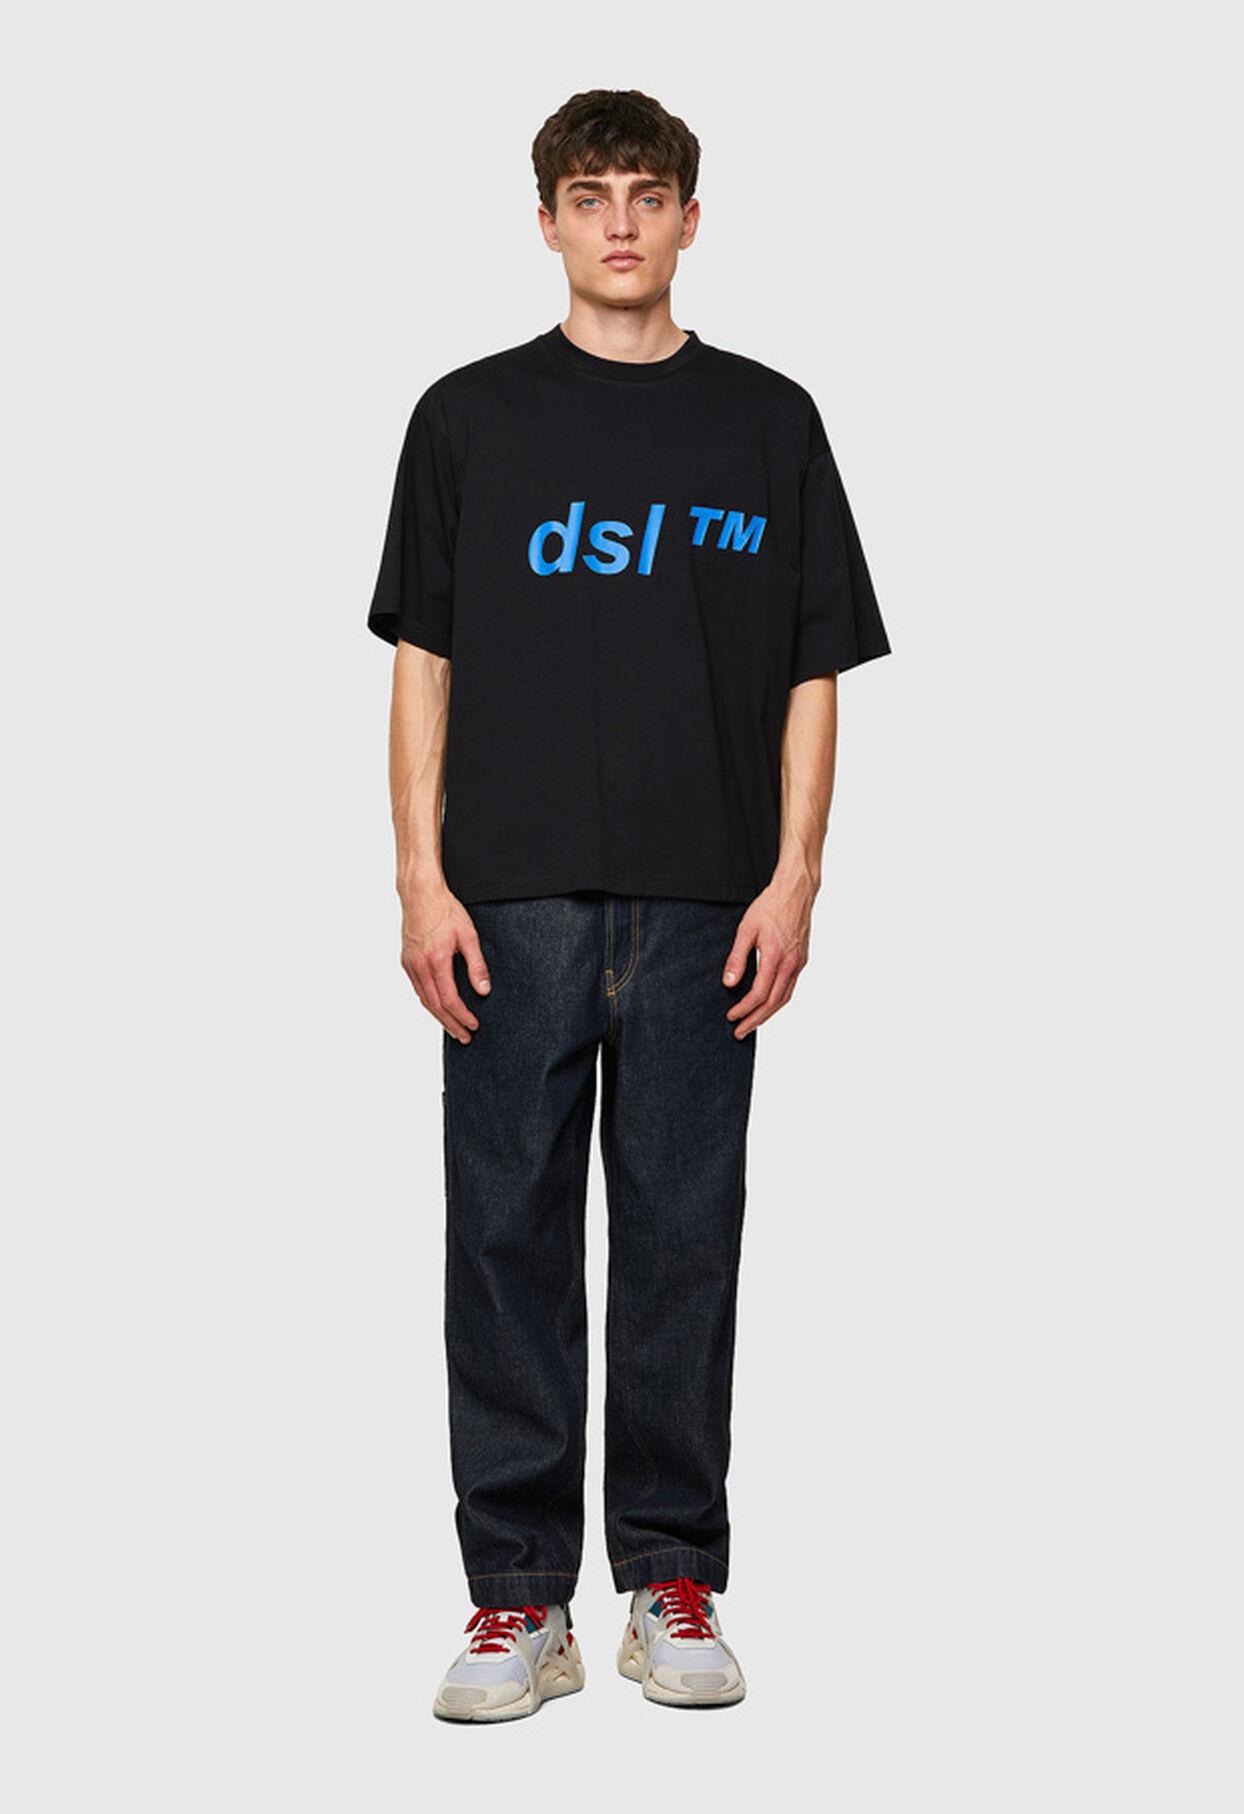 https://dk.diesel.com/dw/image/v2/BBLG_PRD/on/demandware.static/-/Library-Sites-DieselMFSharedLibrary/default/dwc2b2d1f7/CATEGORYOV/2x2_t-balm_A02798_0HAYU_9XX_C.jpg?sw=1244&sh=1814